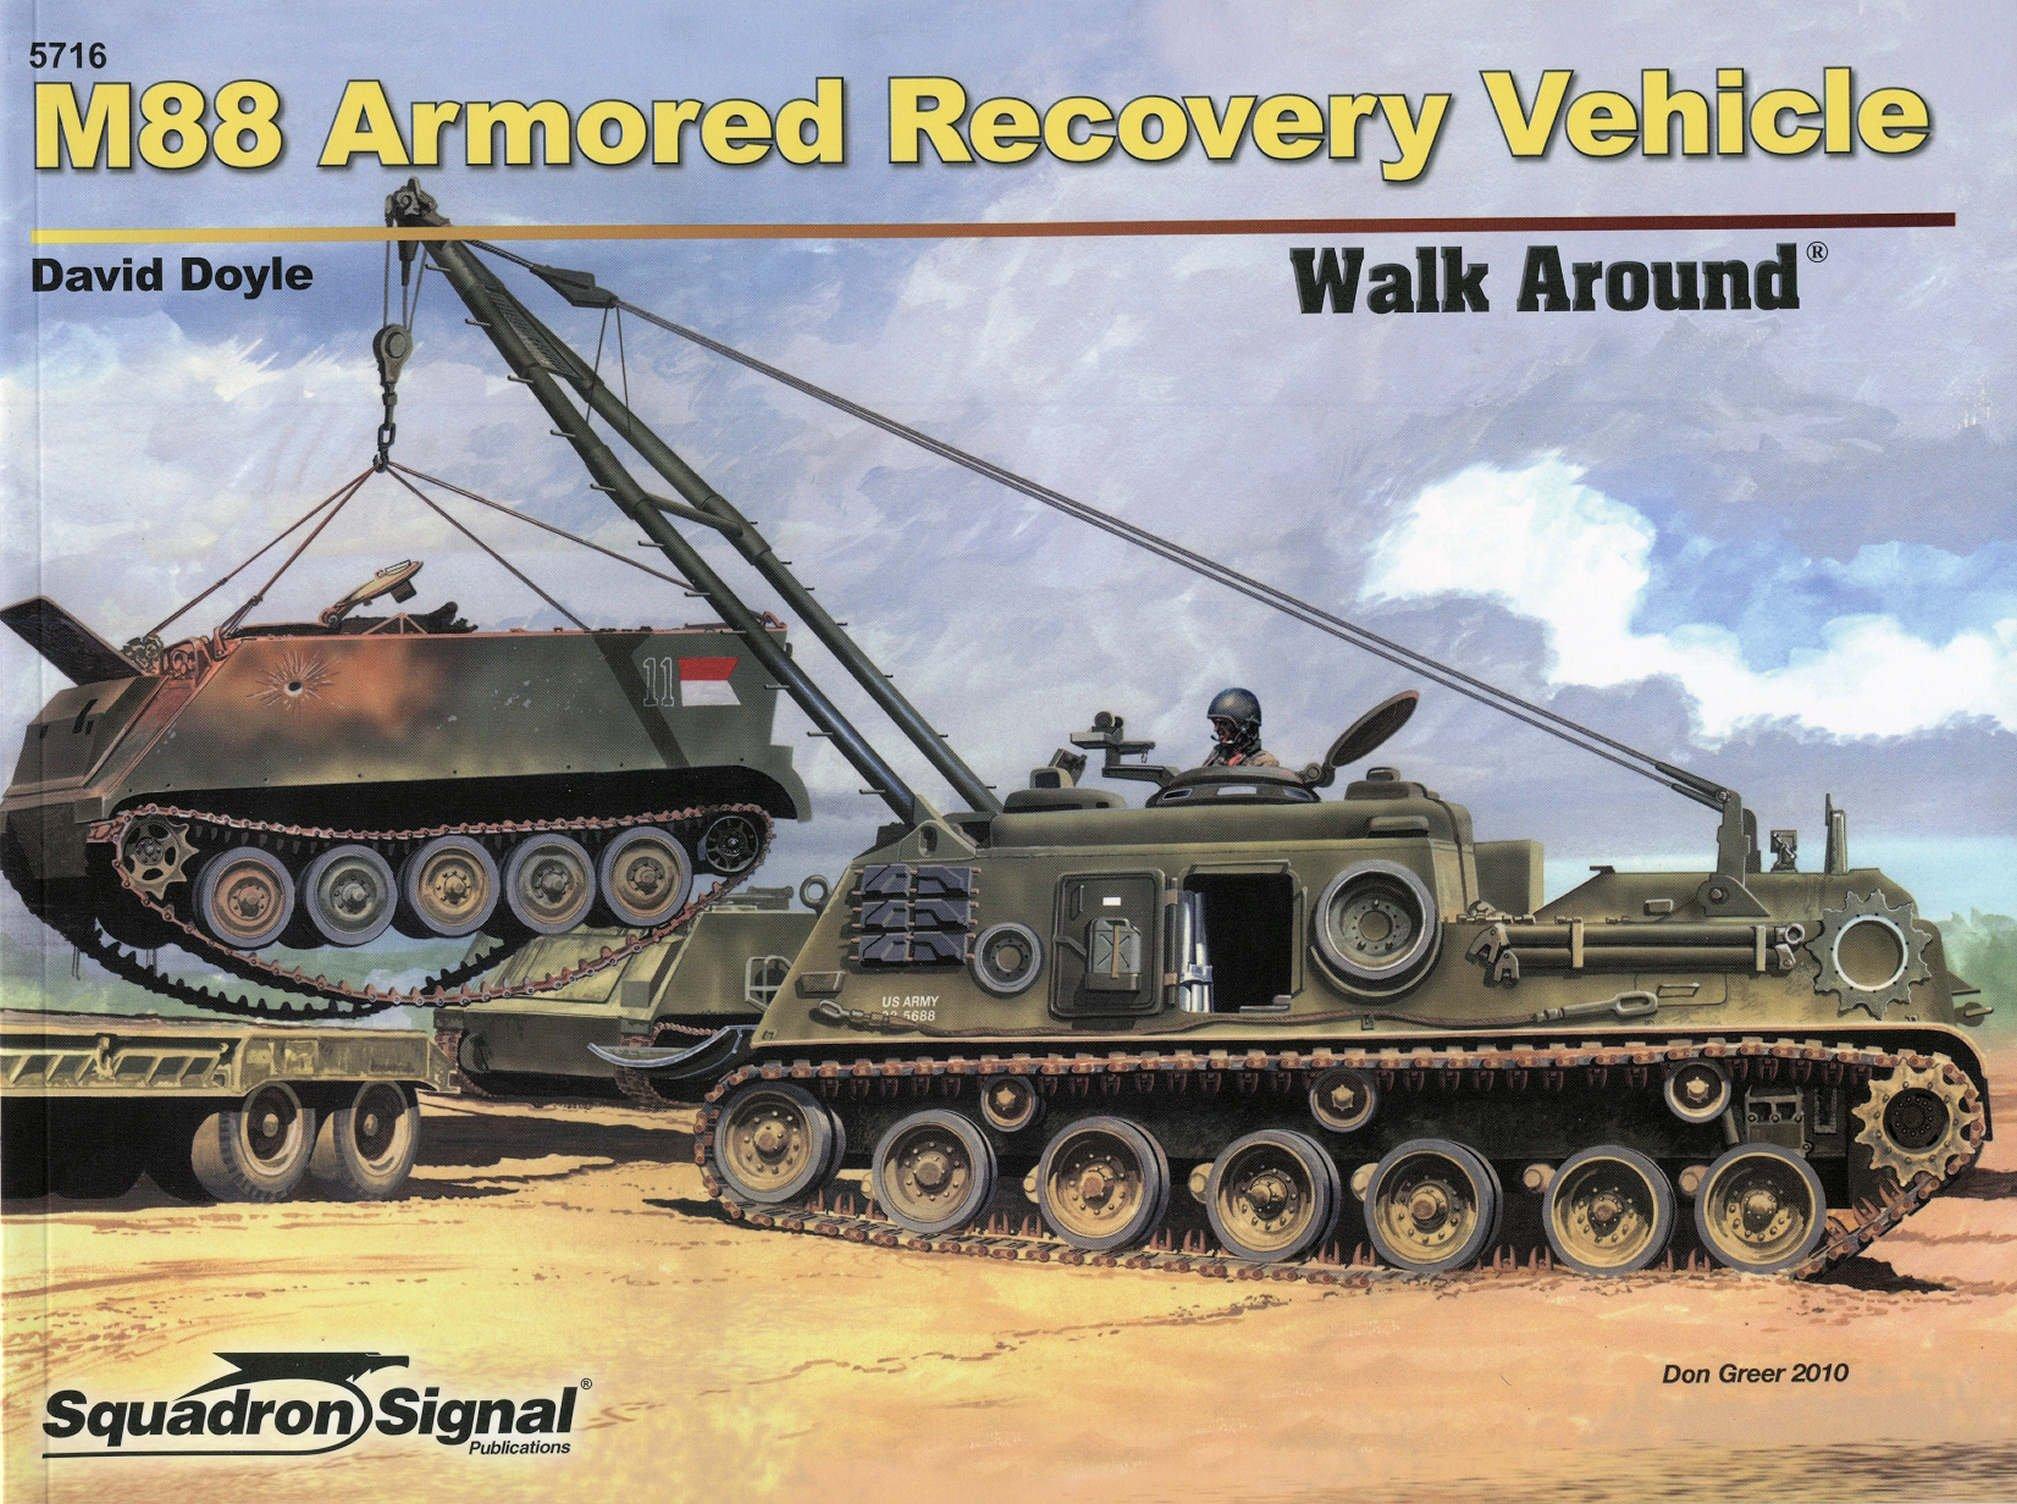 M88 armored recovery vehicle armor walk around no 16 david doyle m88 armored recovery vehicle armor walk around no 16 david doyle 9780897475990 amazon books reheart Images